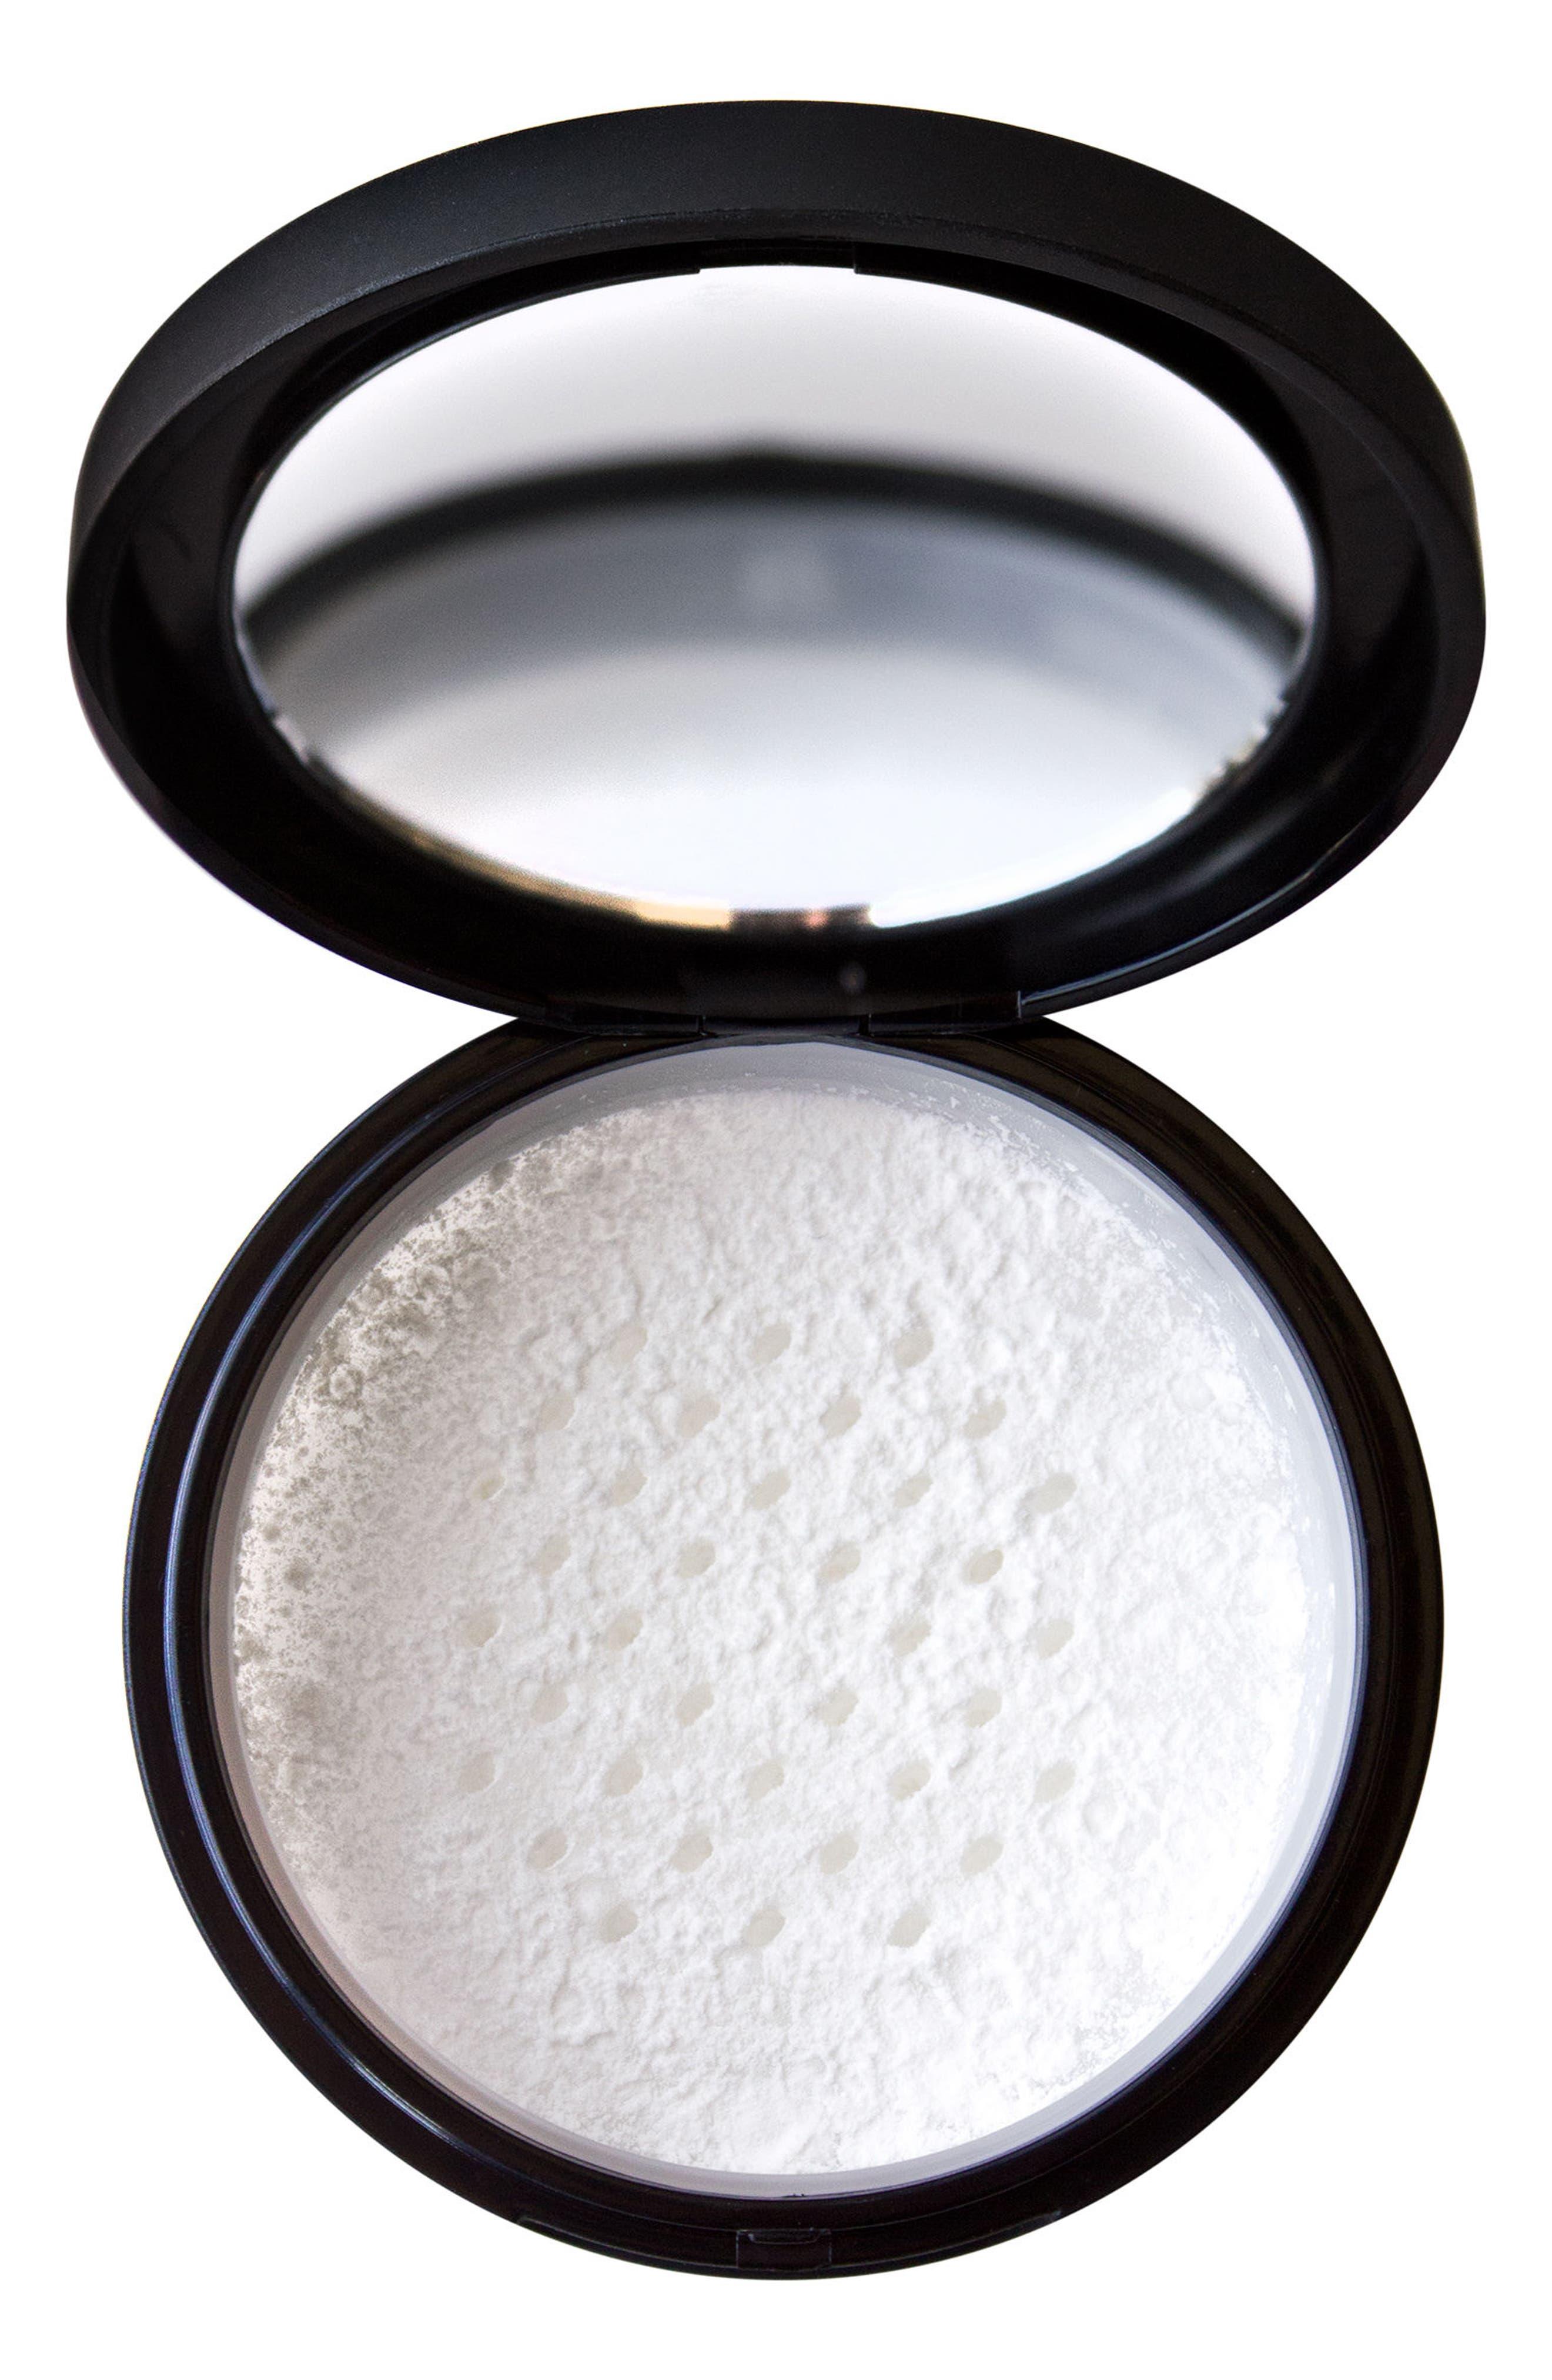 PRO Blurring Translucent Loose Powder,                         Main,                         color, No Color